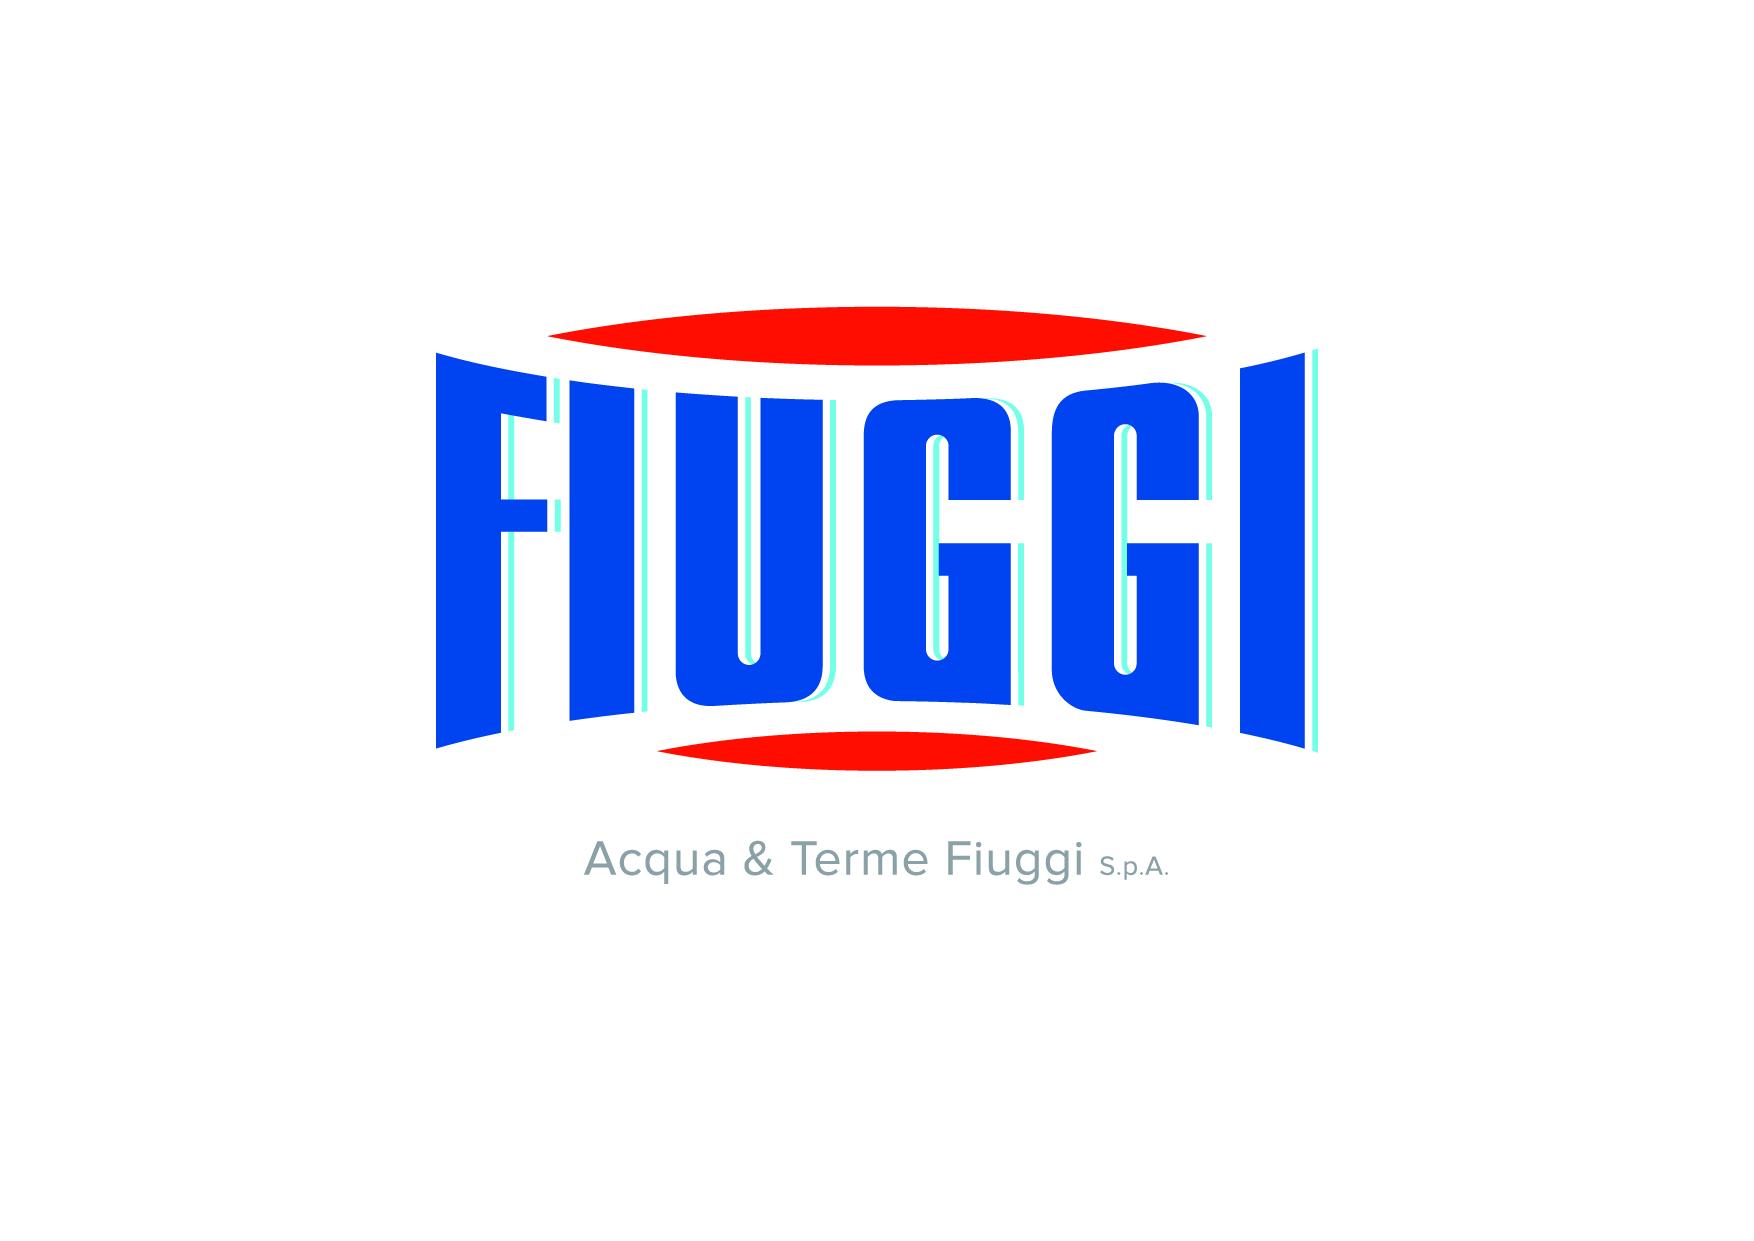 277619 fiuggi 9608f5 original 1523548928